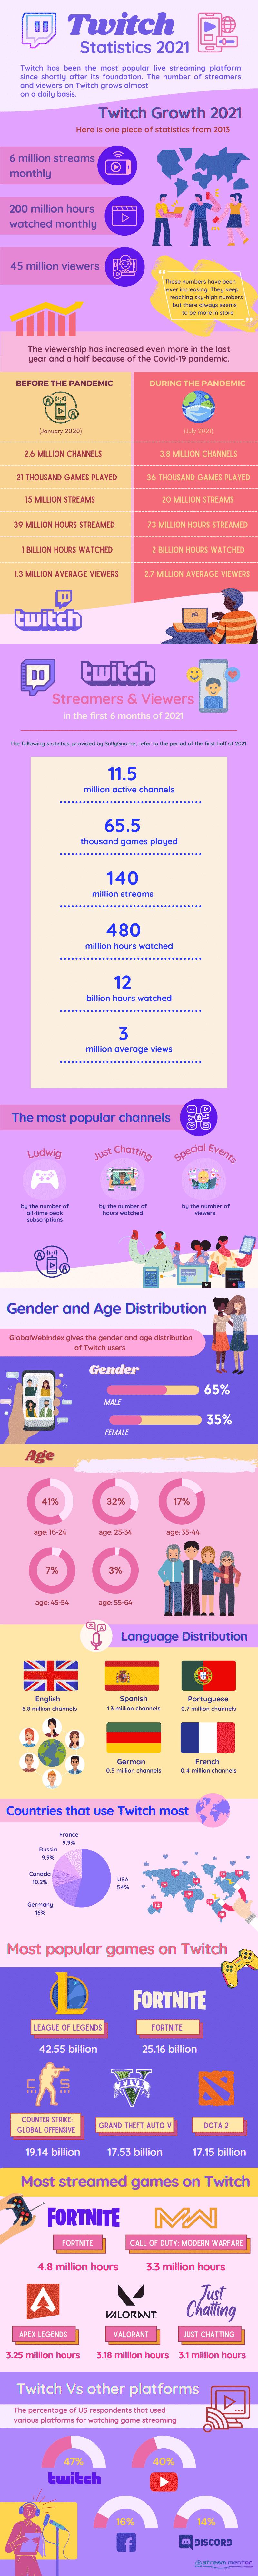 twitch statistics infographic